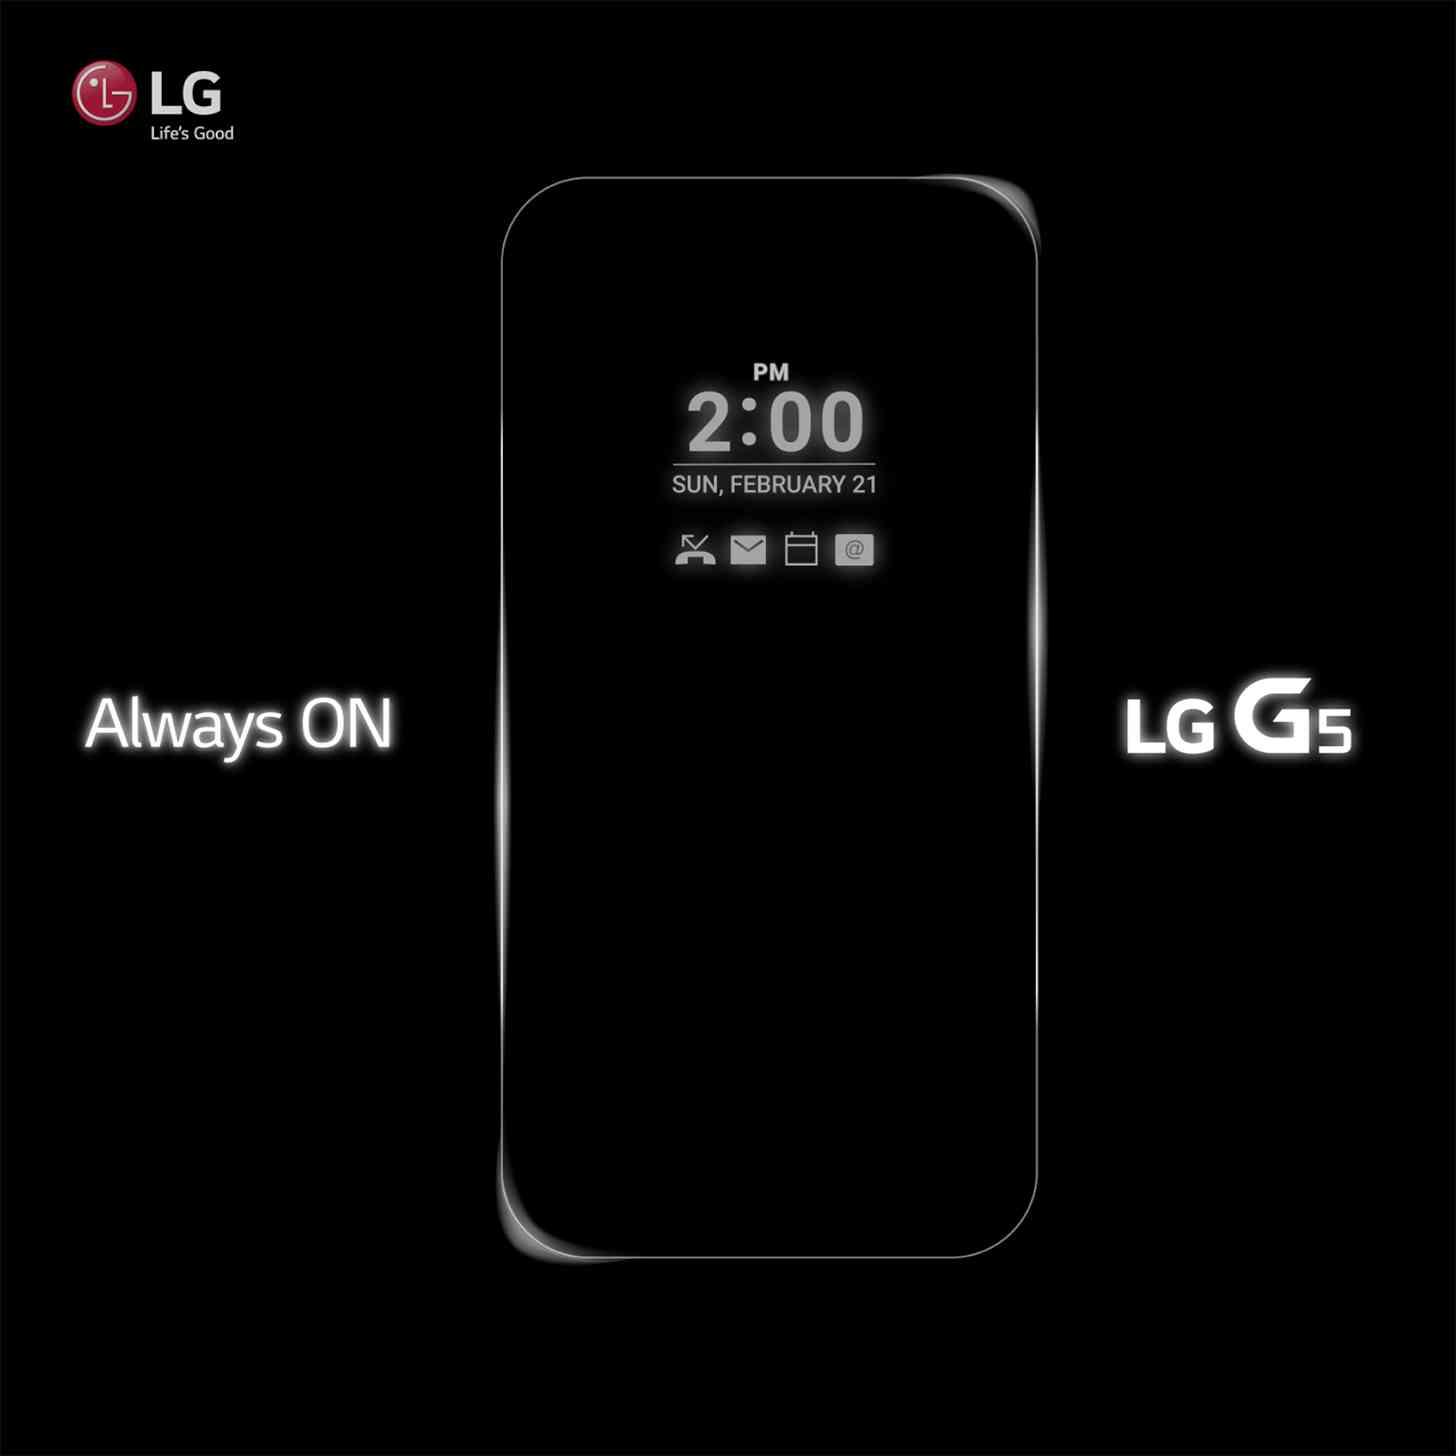 LG G5 always-on display teaser